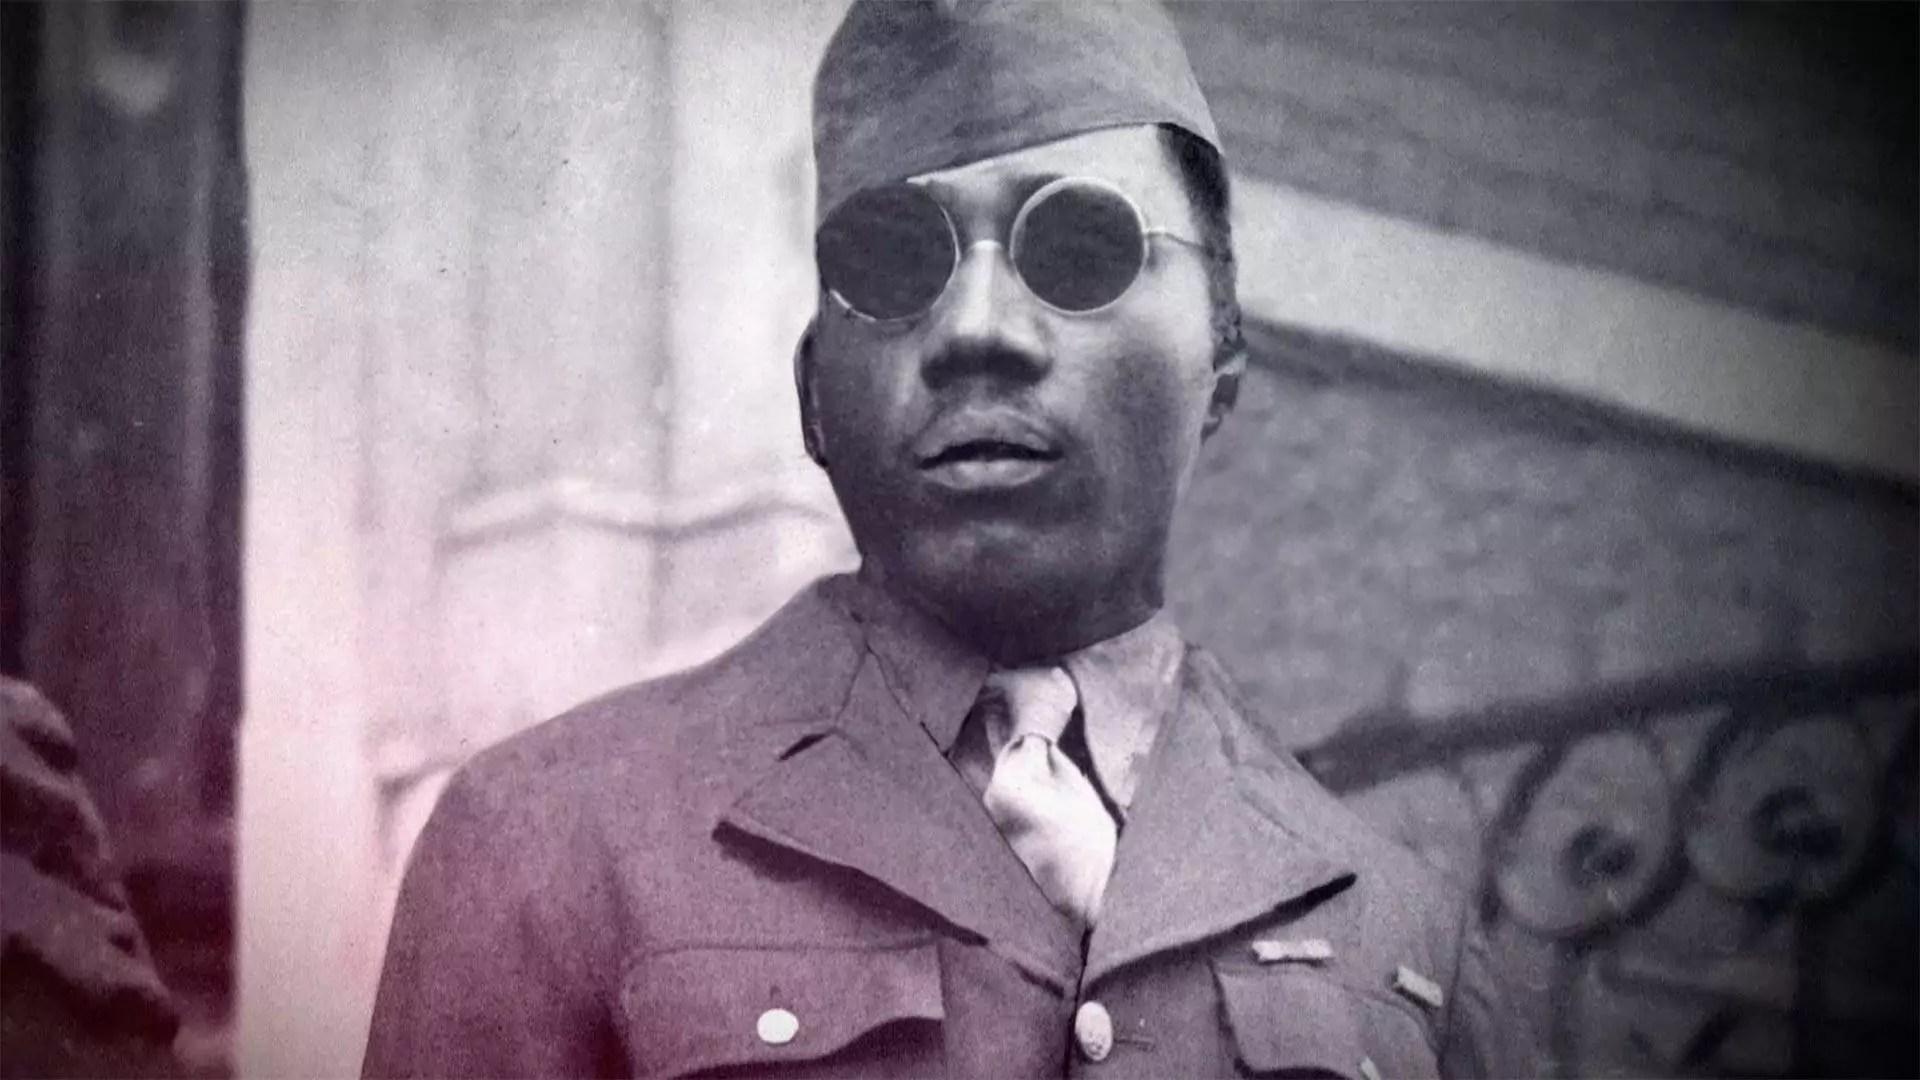 WWII veteran Issac Woodard.